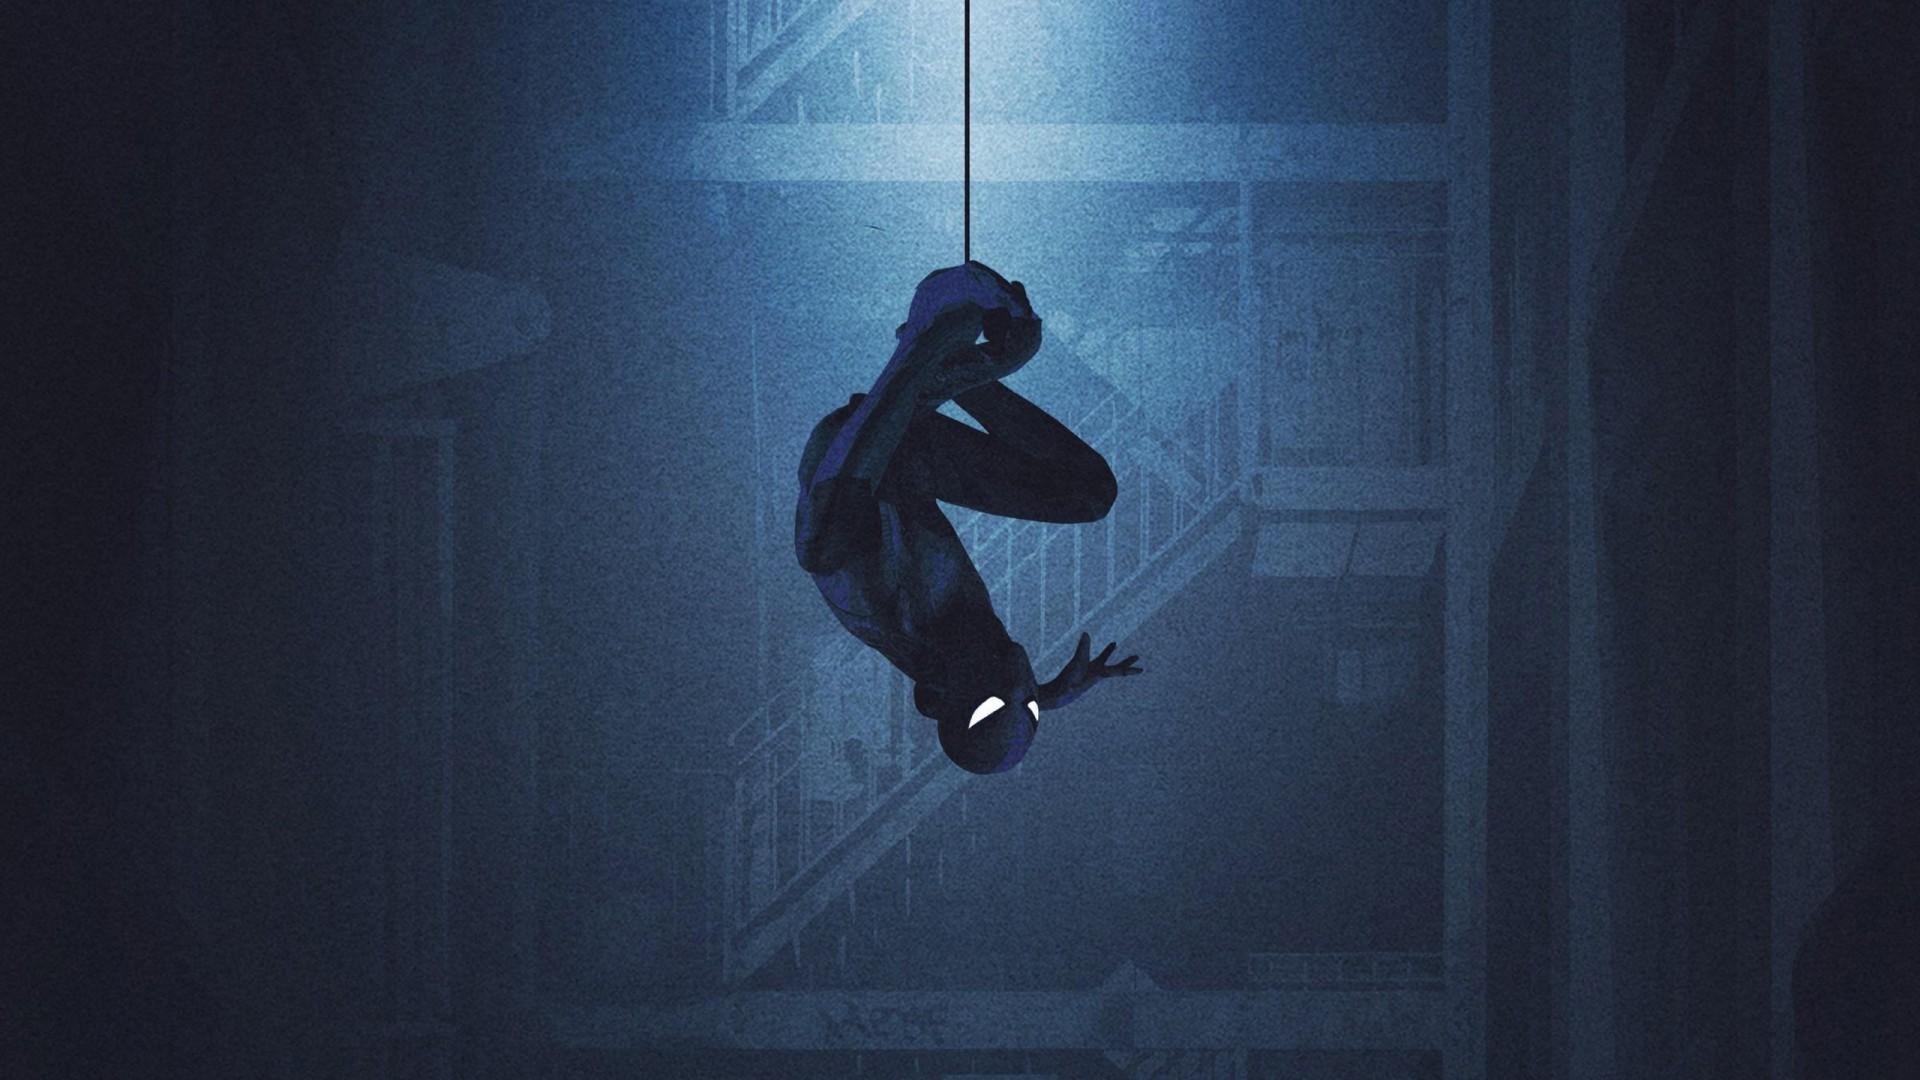 Iphone 5s Wallpaper 3d Spiderman Artwork Wallpapers Hd Wallpapers Id 23117